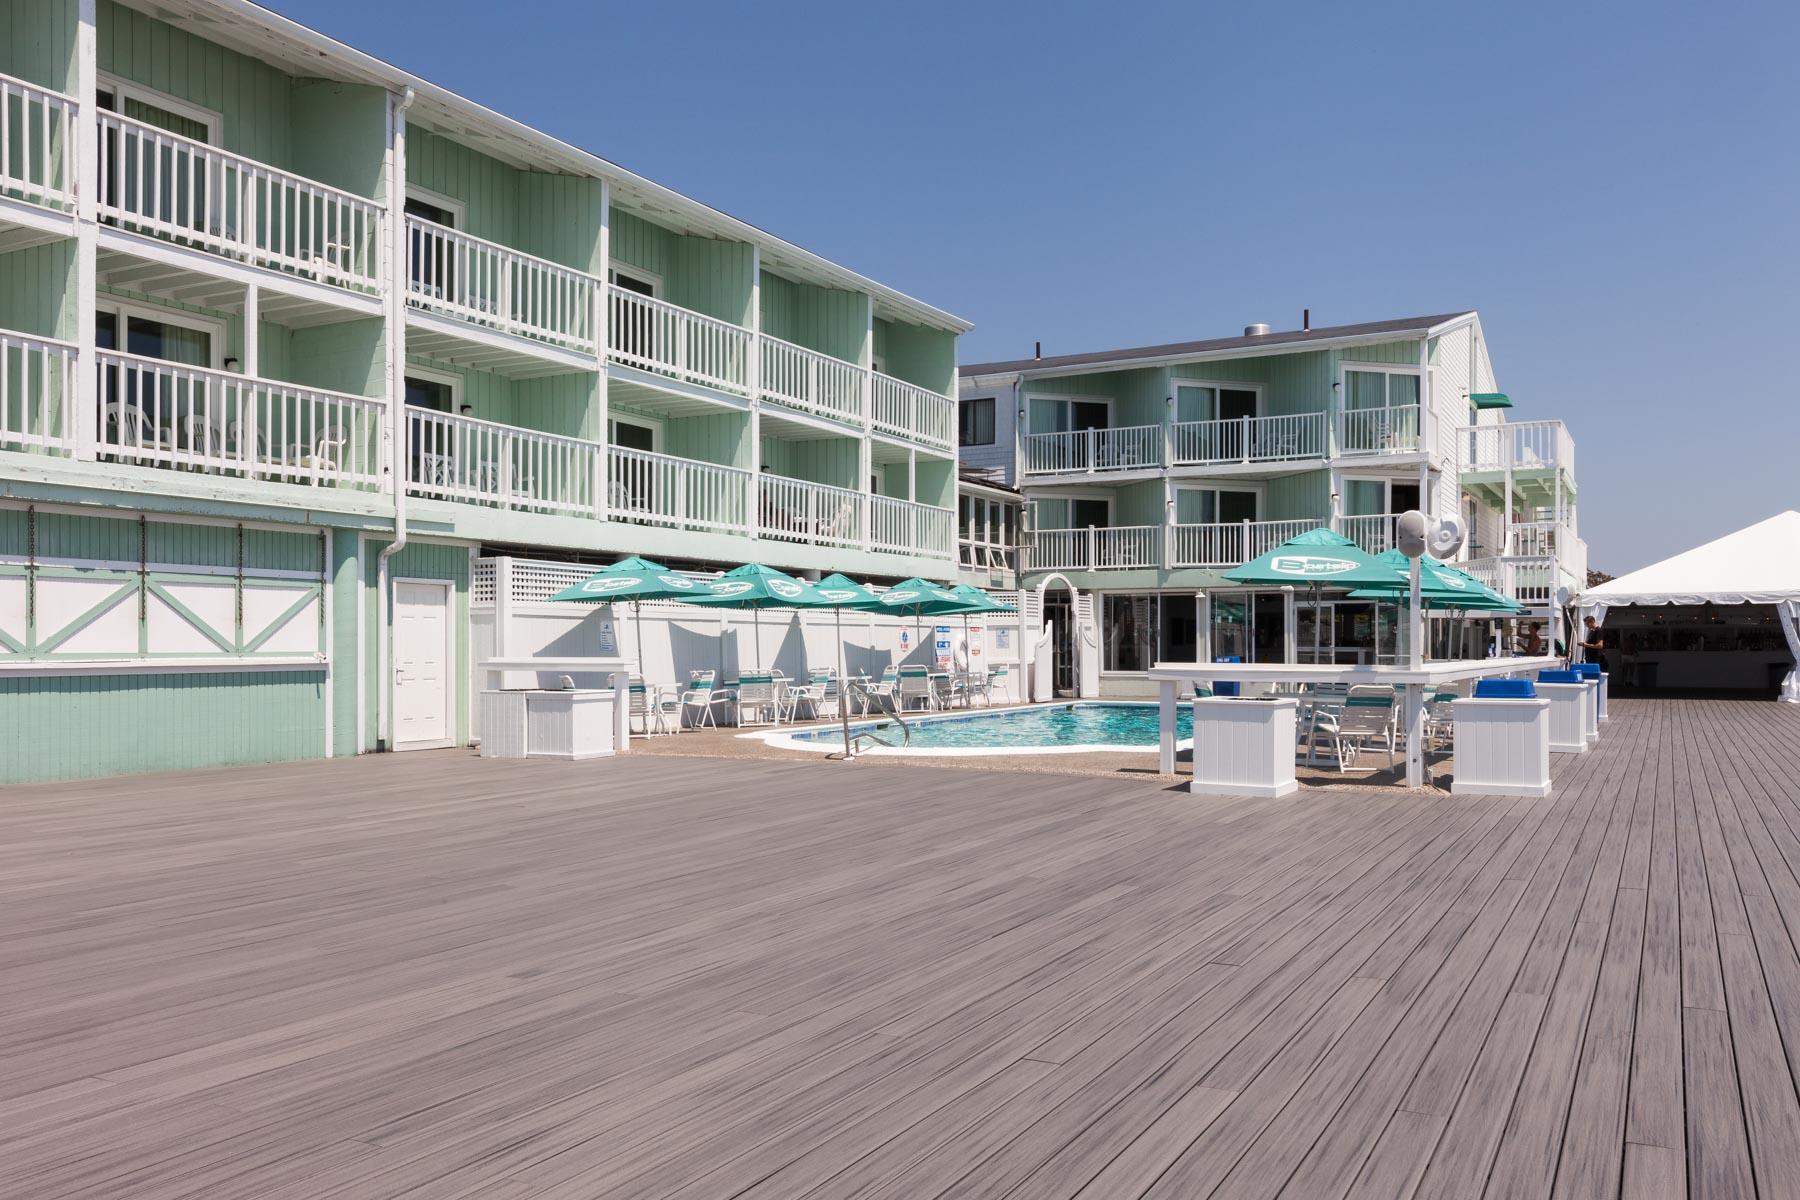 The Boatslip Resort